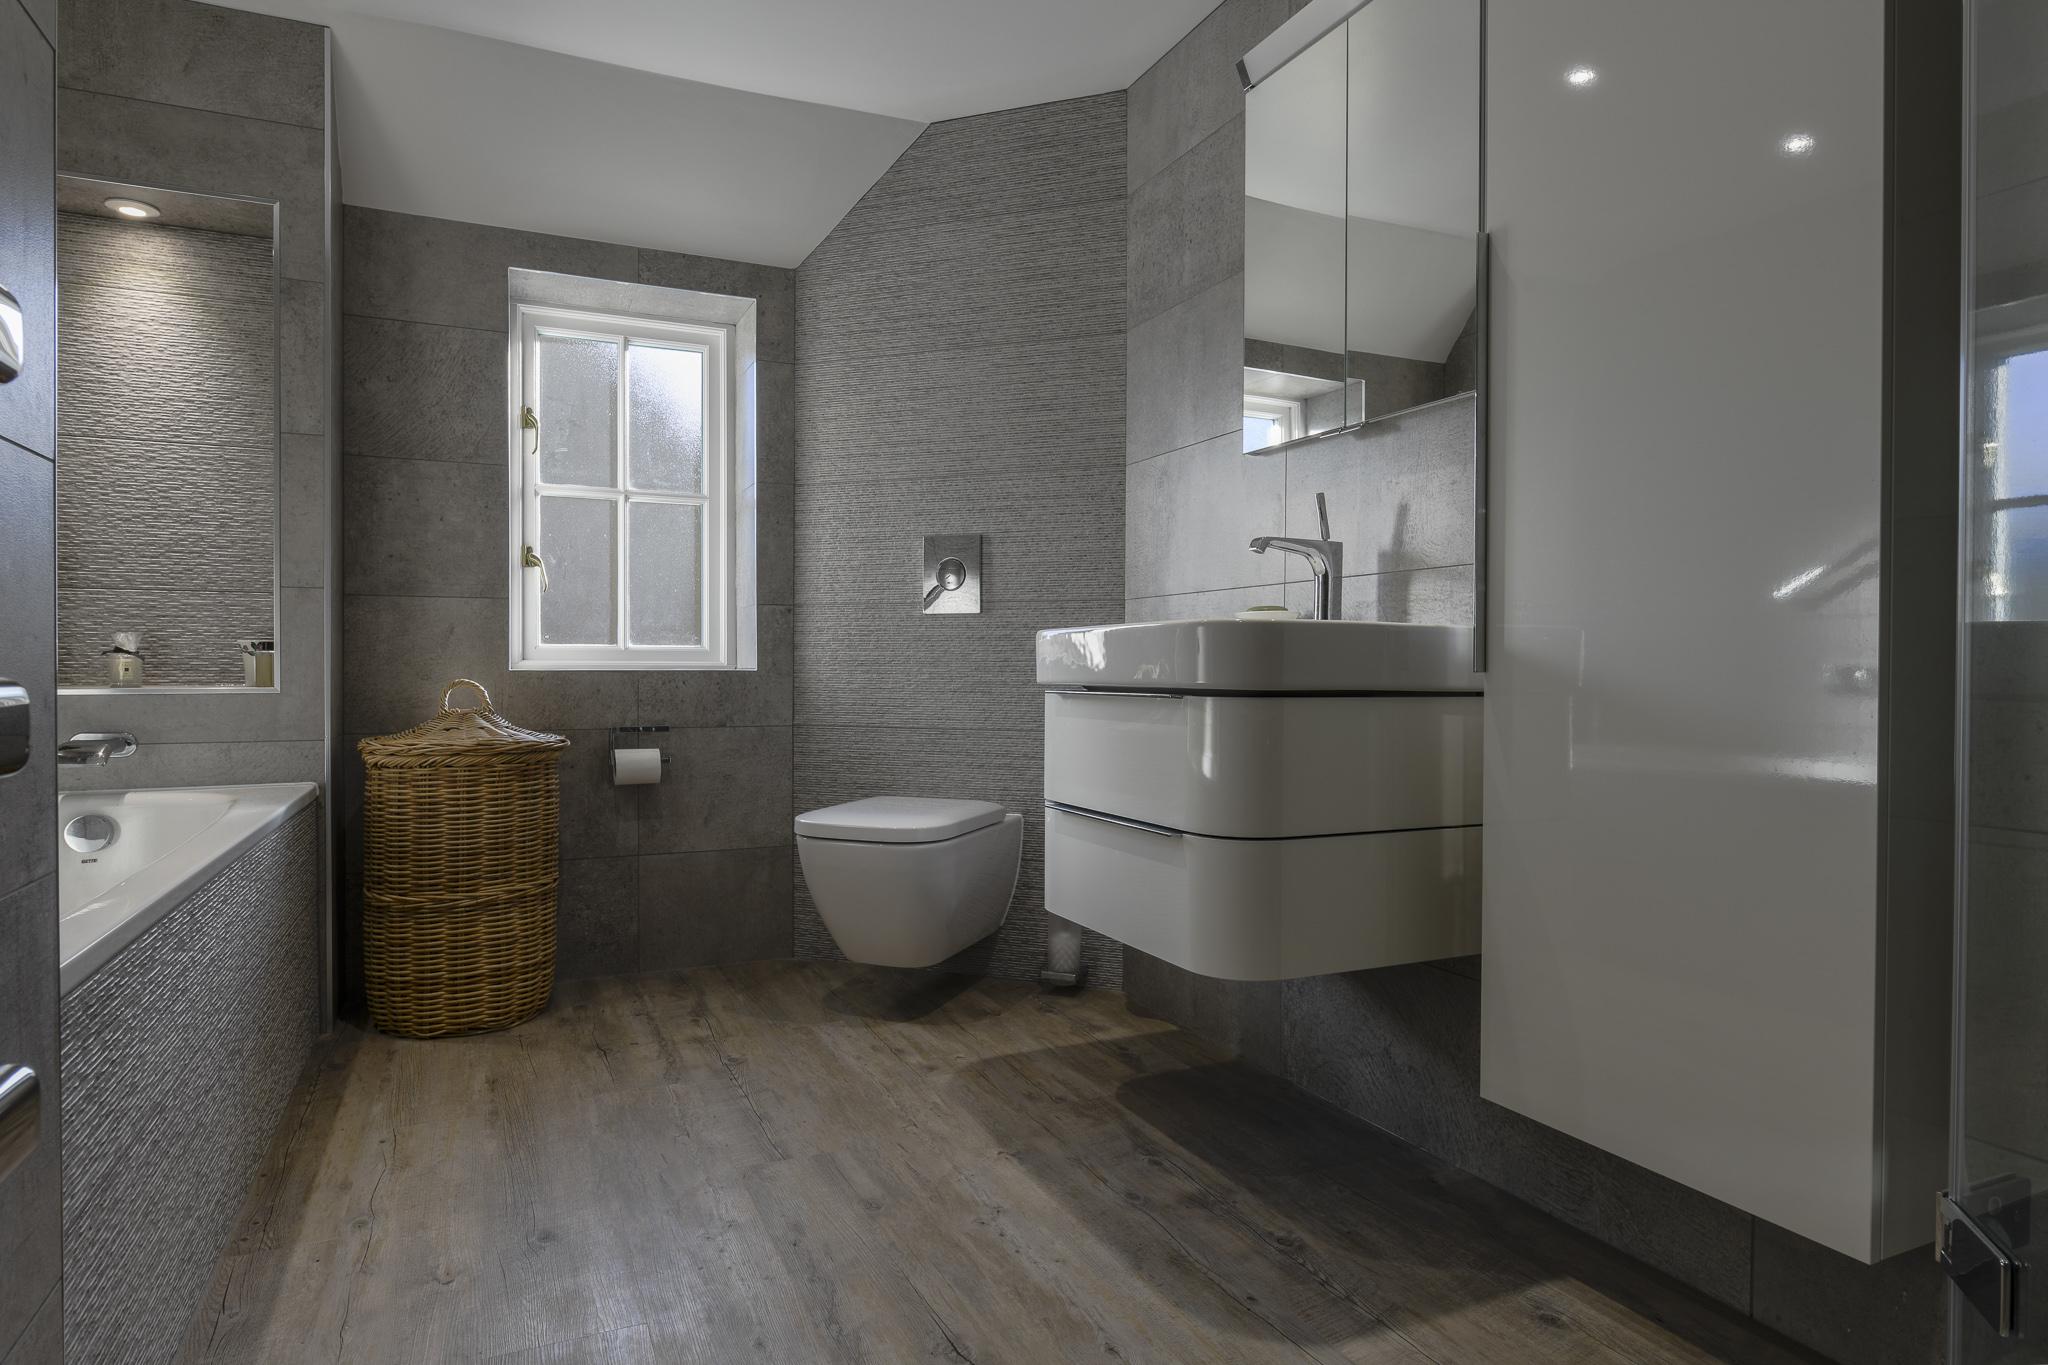 bbr 1 - Bathroom Designs